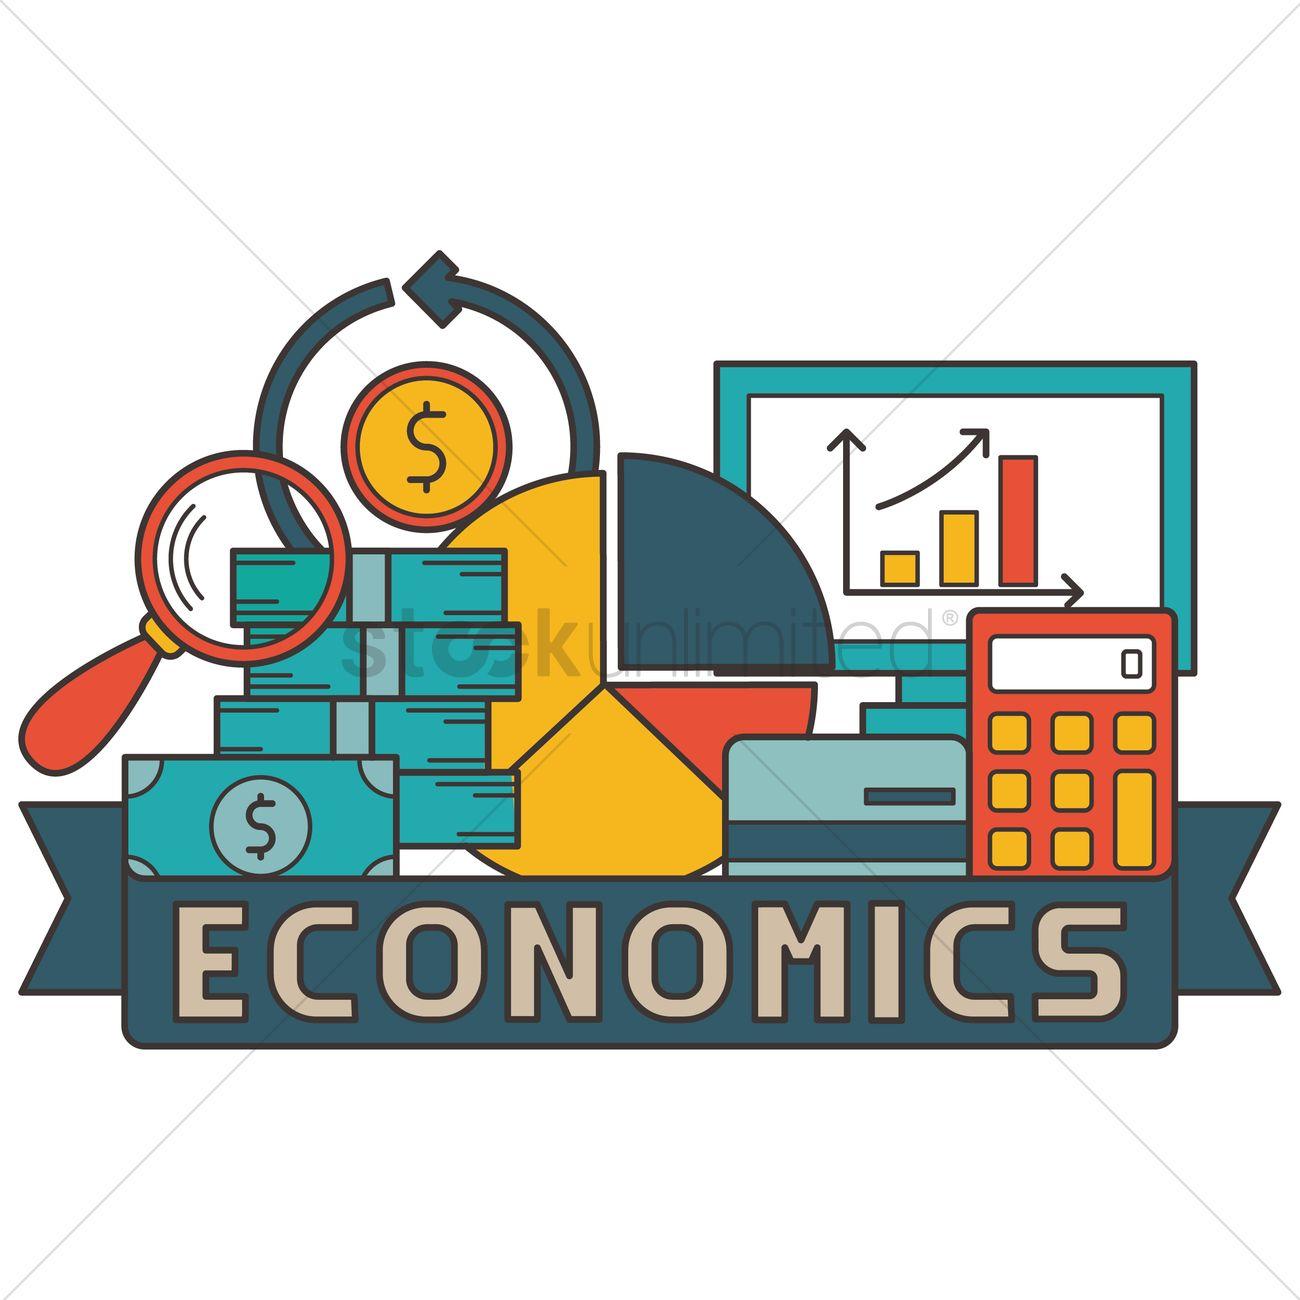 Economics concept design vector image 2010226 for Design economico